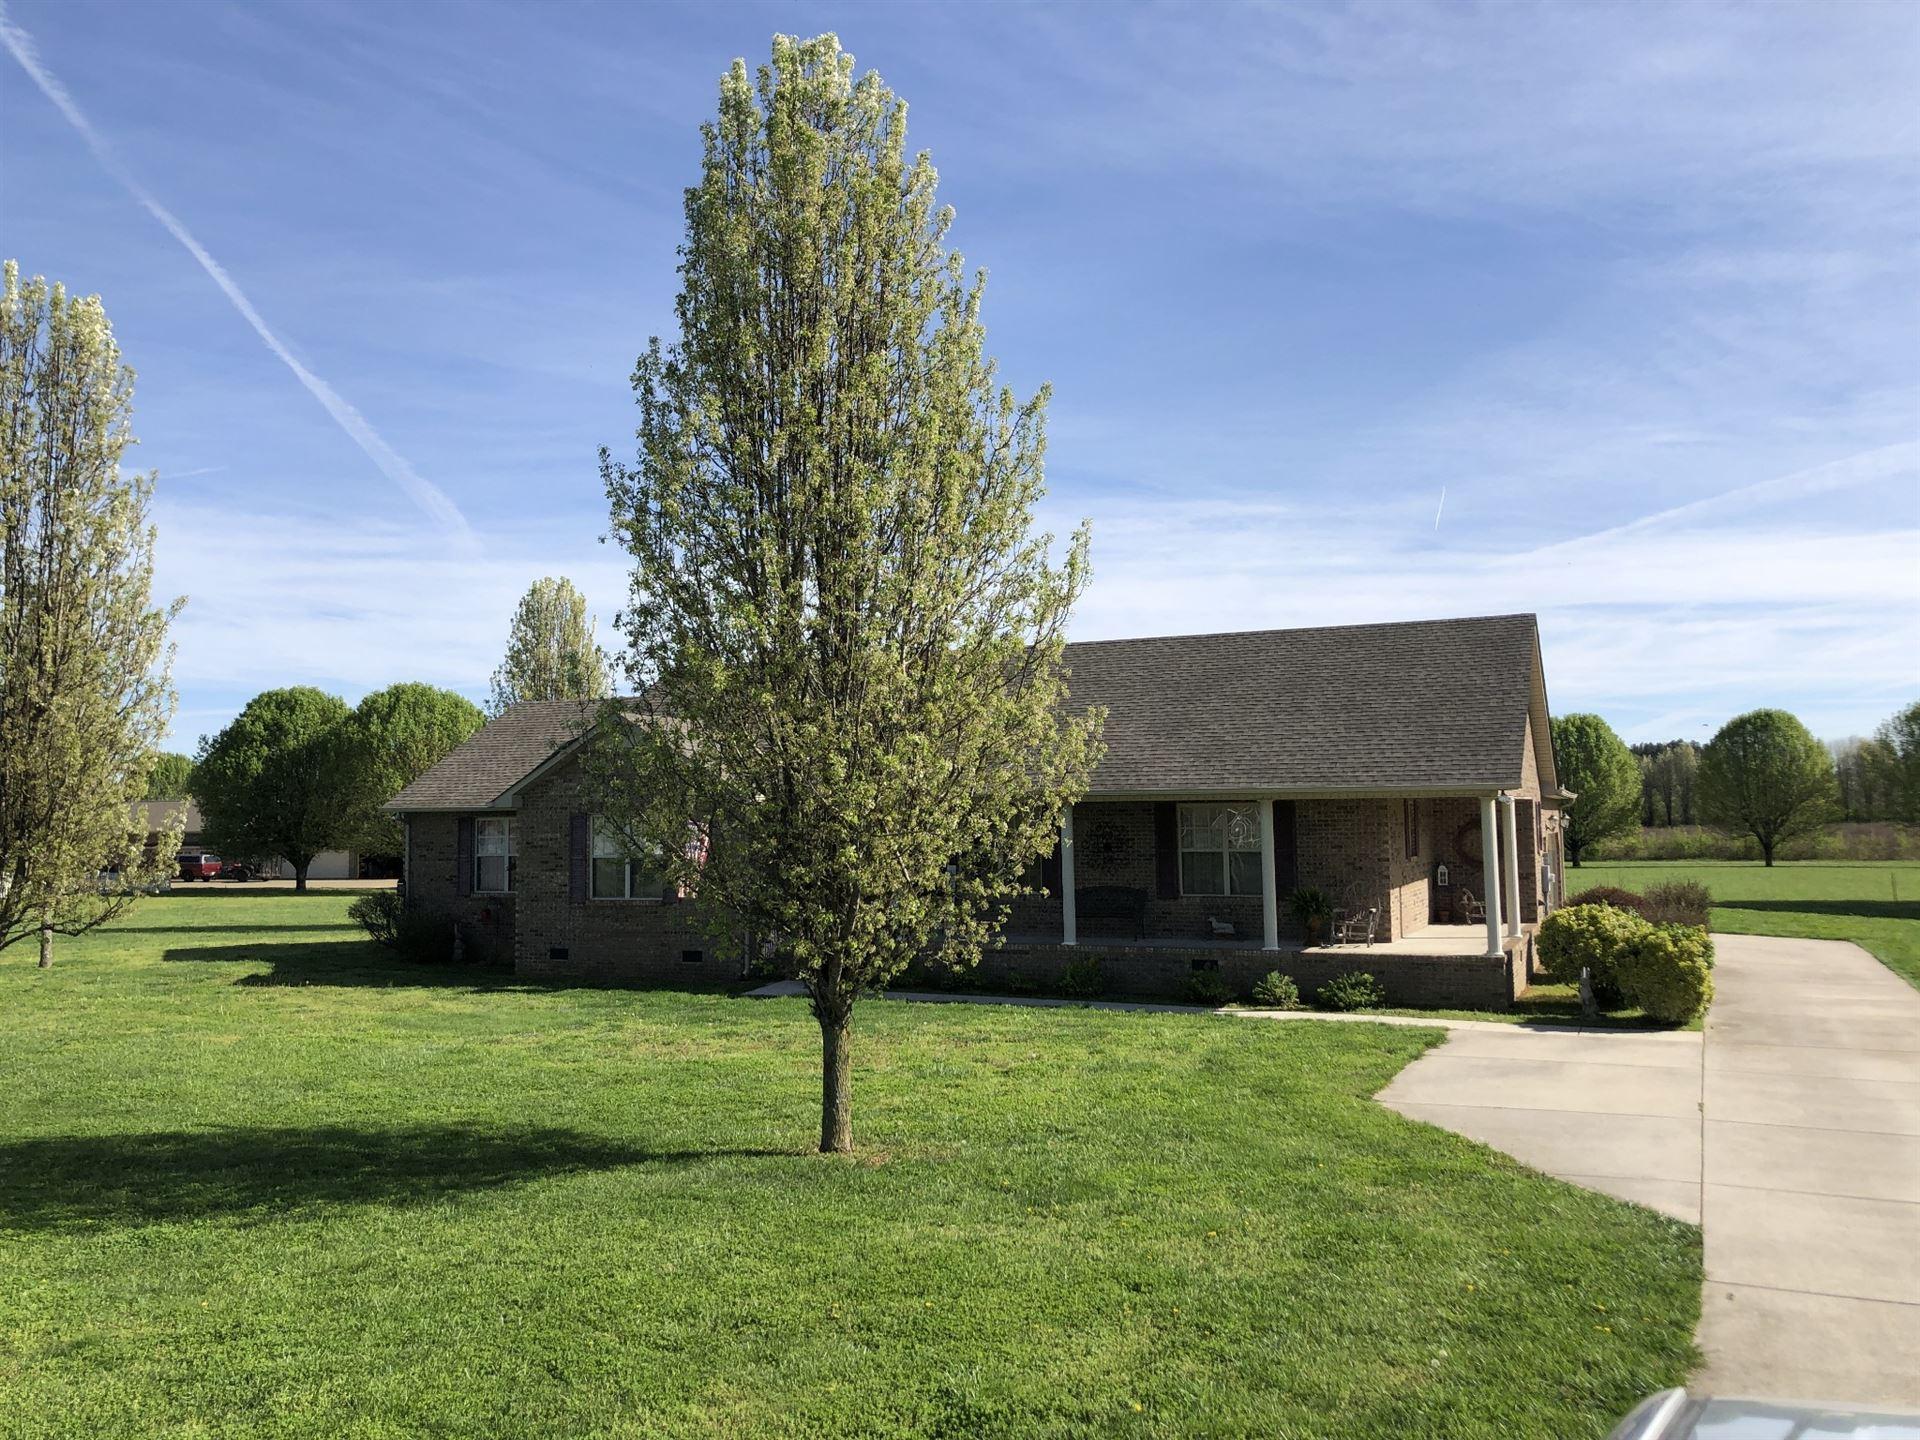 57 Freeman Ct, Winchester, TN 37398 - MLS#: 2239383